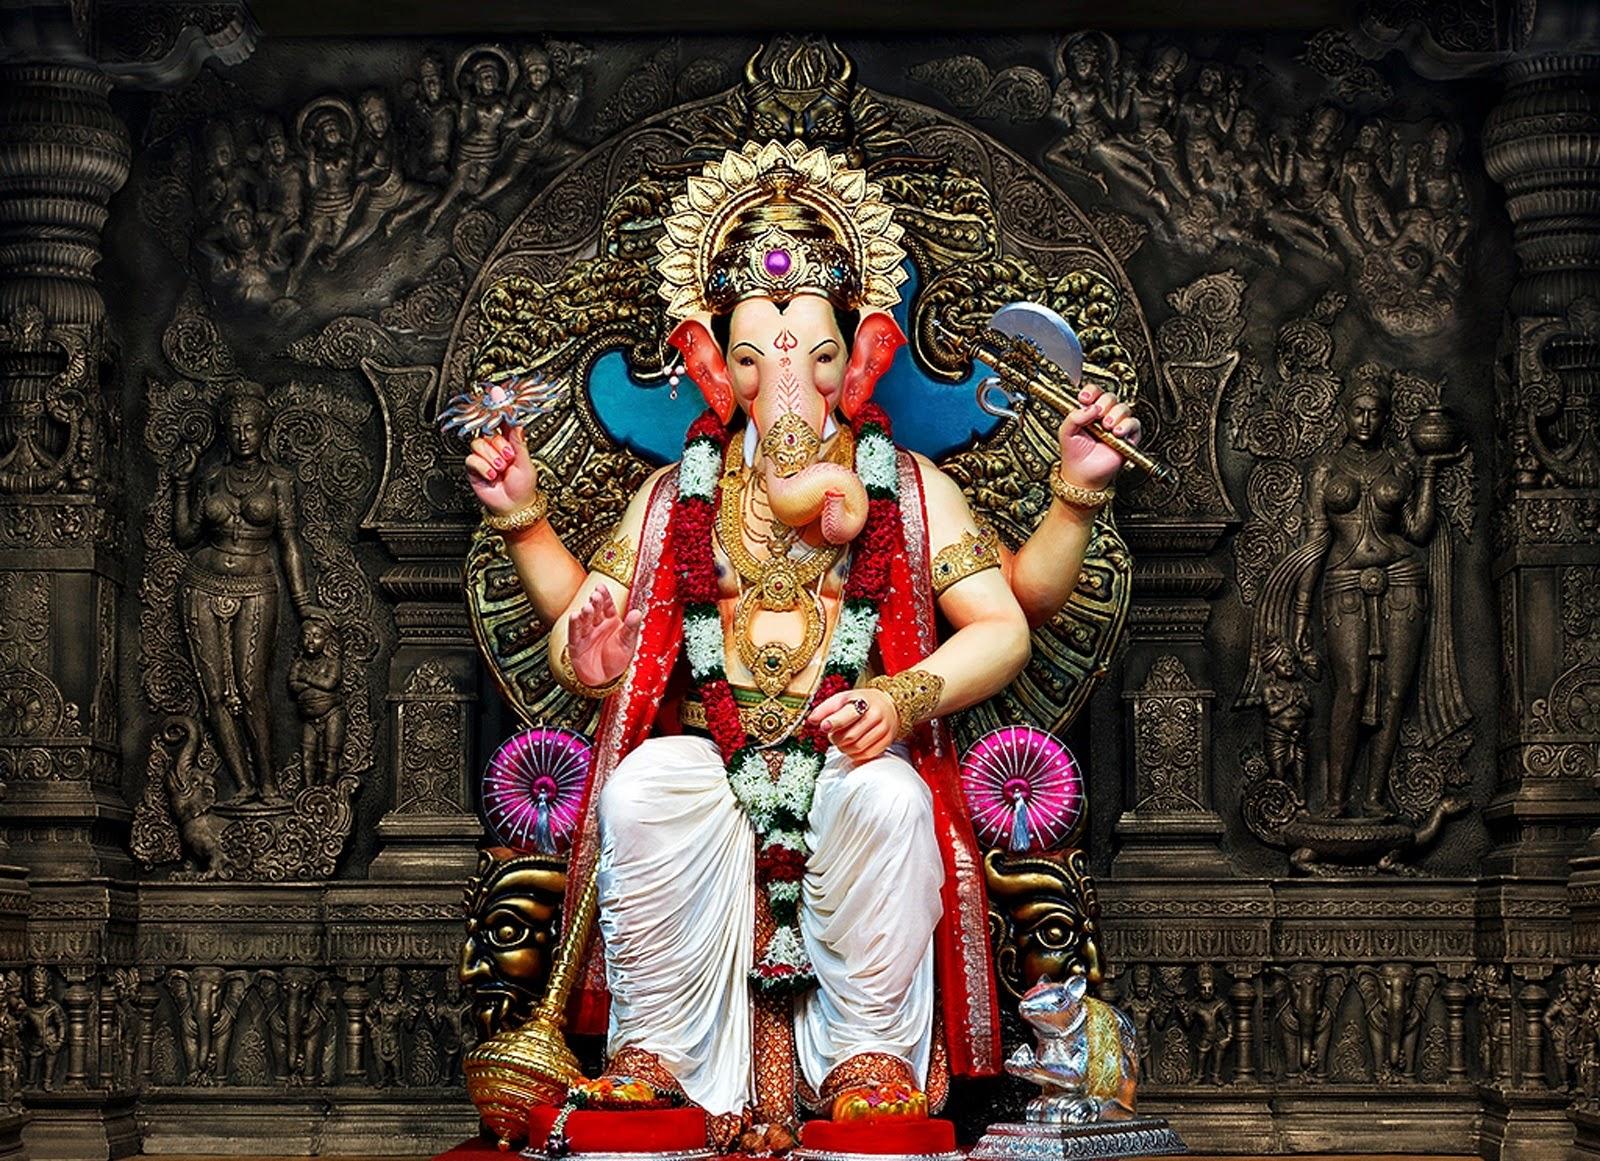 Lord ganesh hd wallpapers devationals - Ganesh bhagwan image hd ...